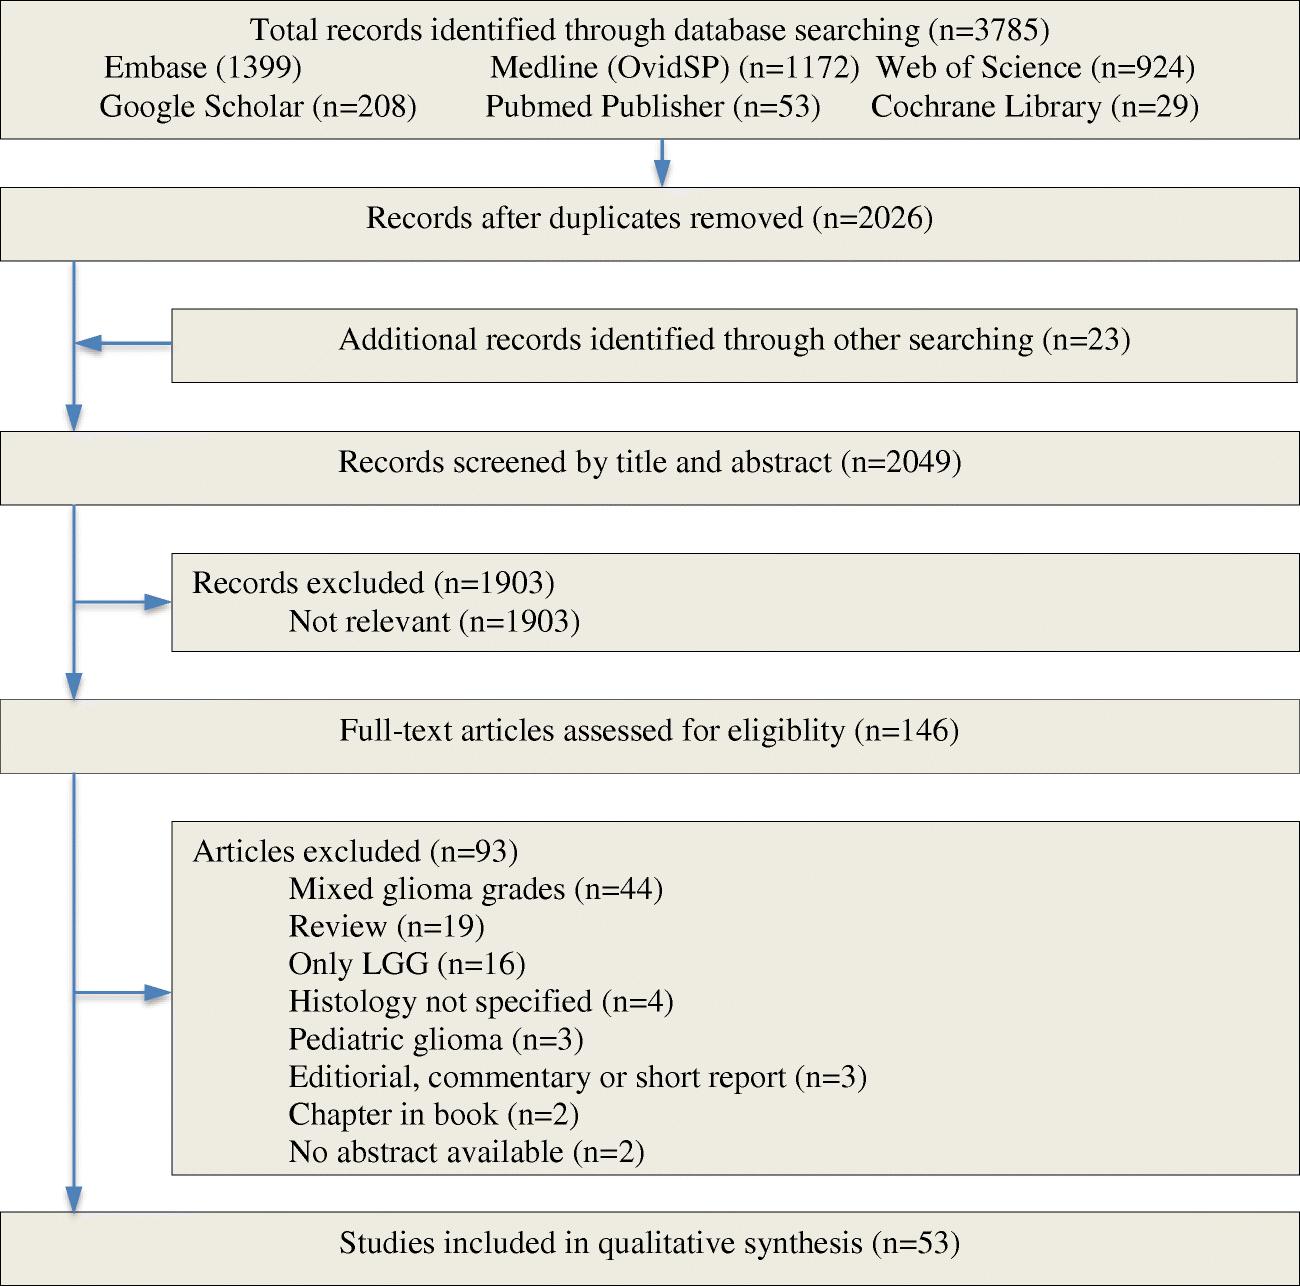 Impact of intraoperative stimulation mapping on high-grade glioma